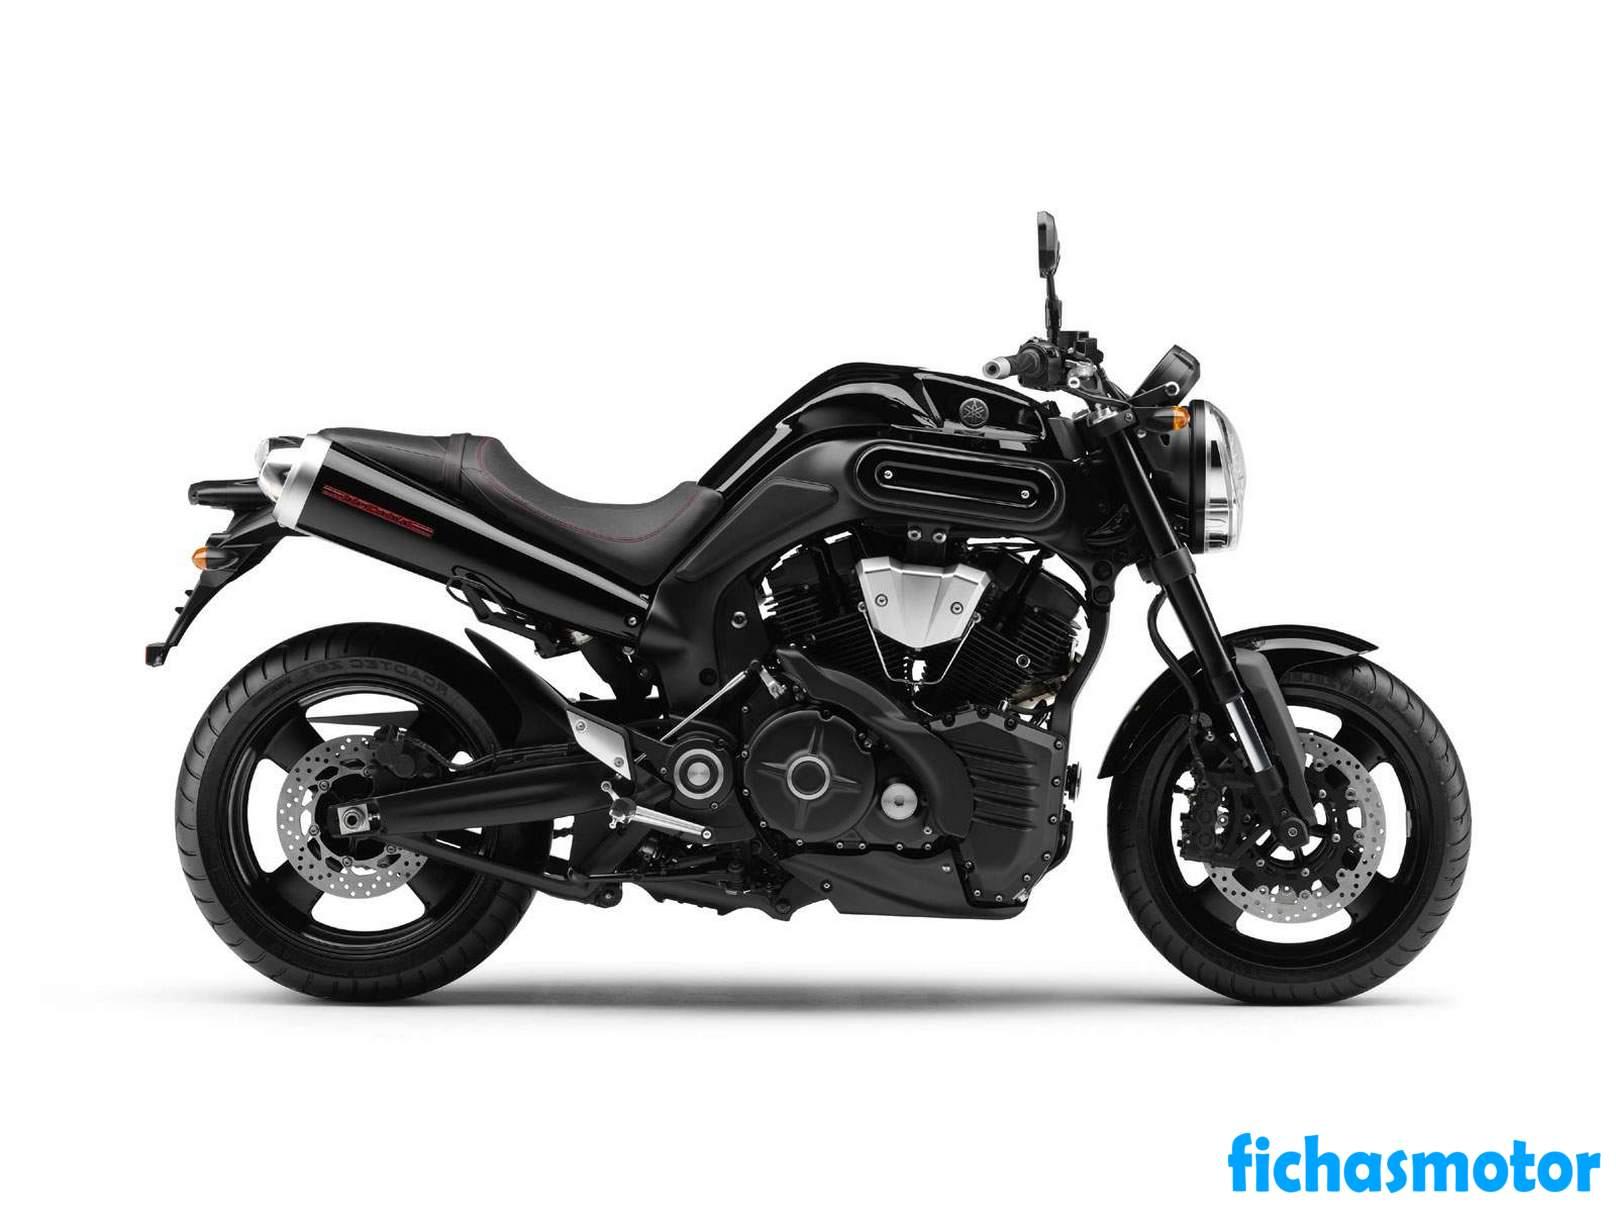 Ficha técnica Yamaha mt-01 2012